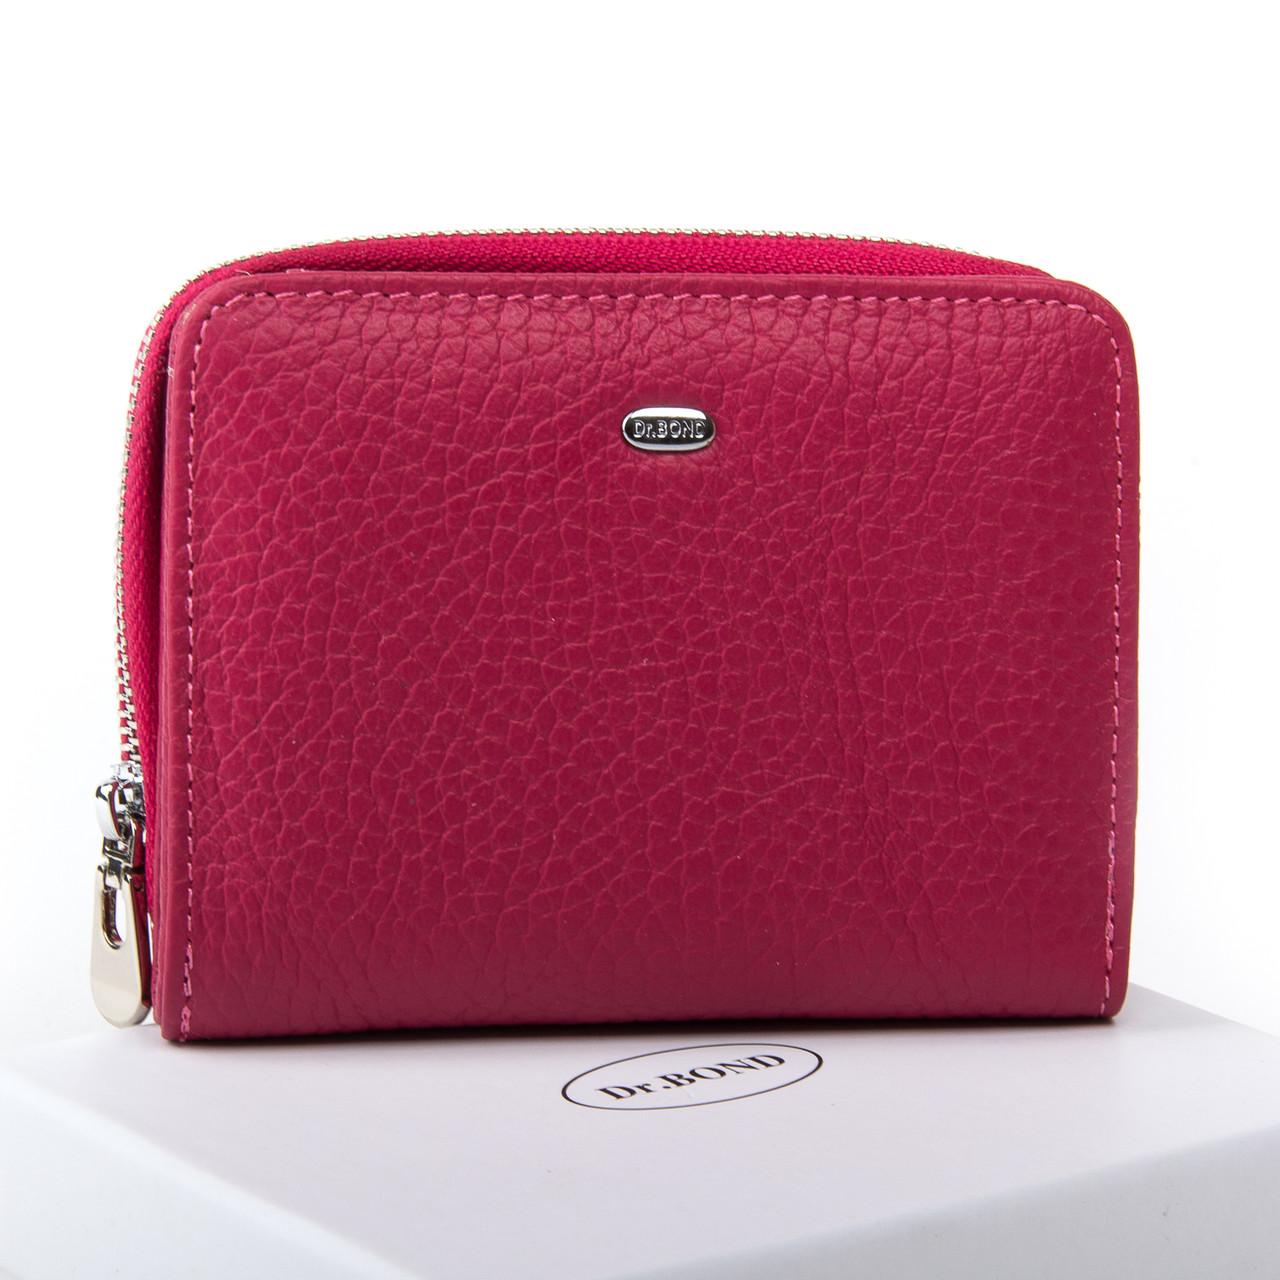 Жеснкий кошелек Classic кожа DR. BOND WN-4 розовый